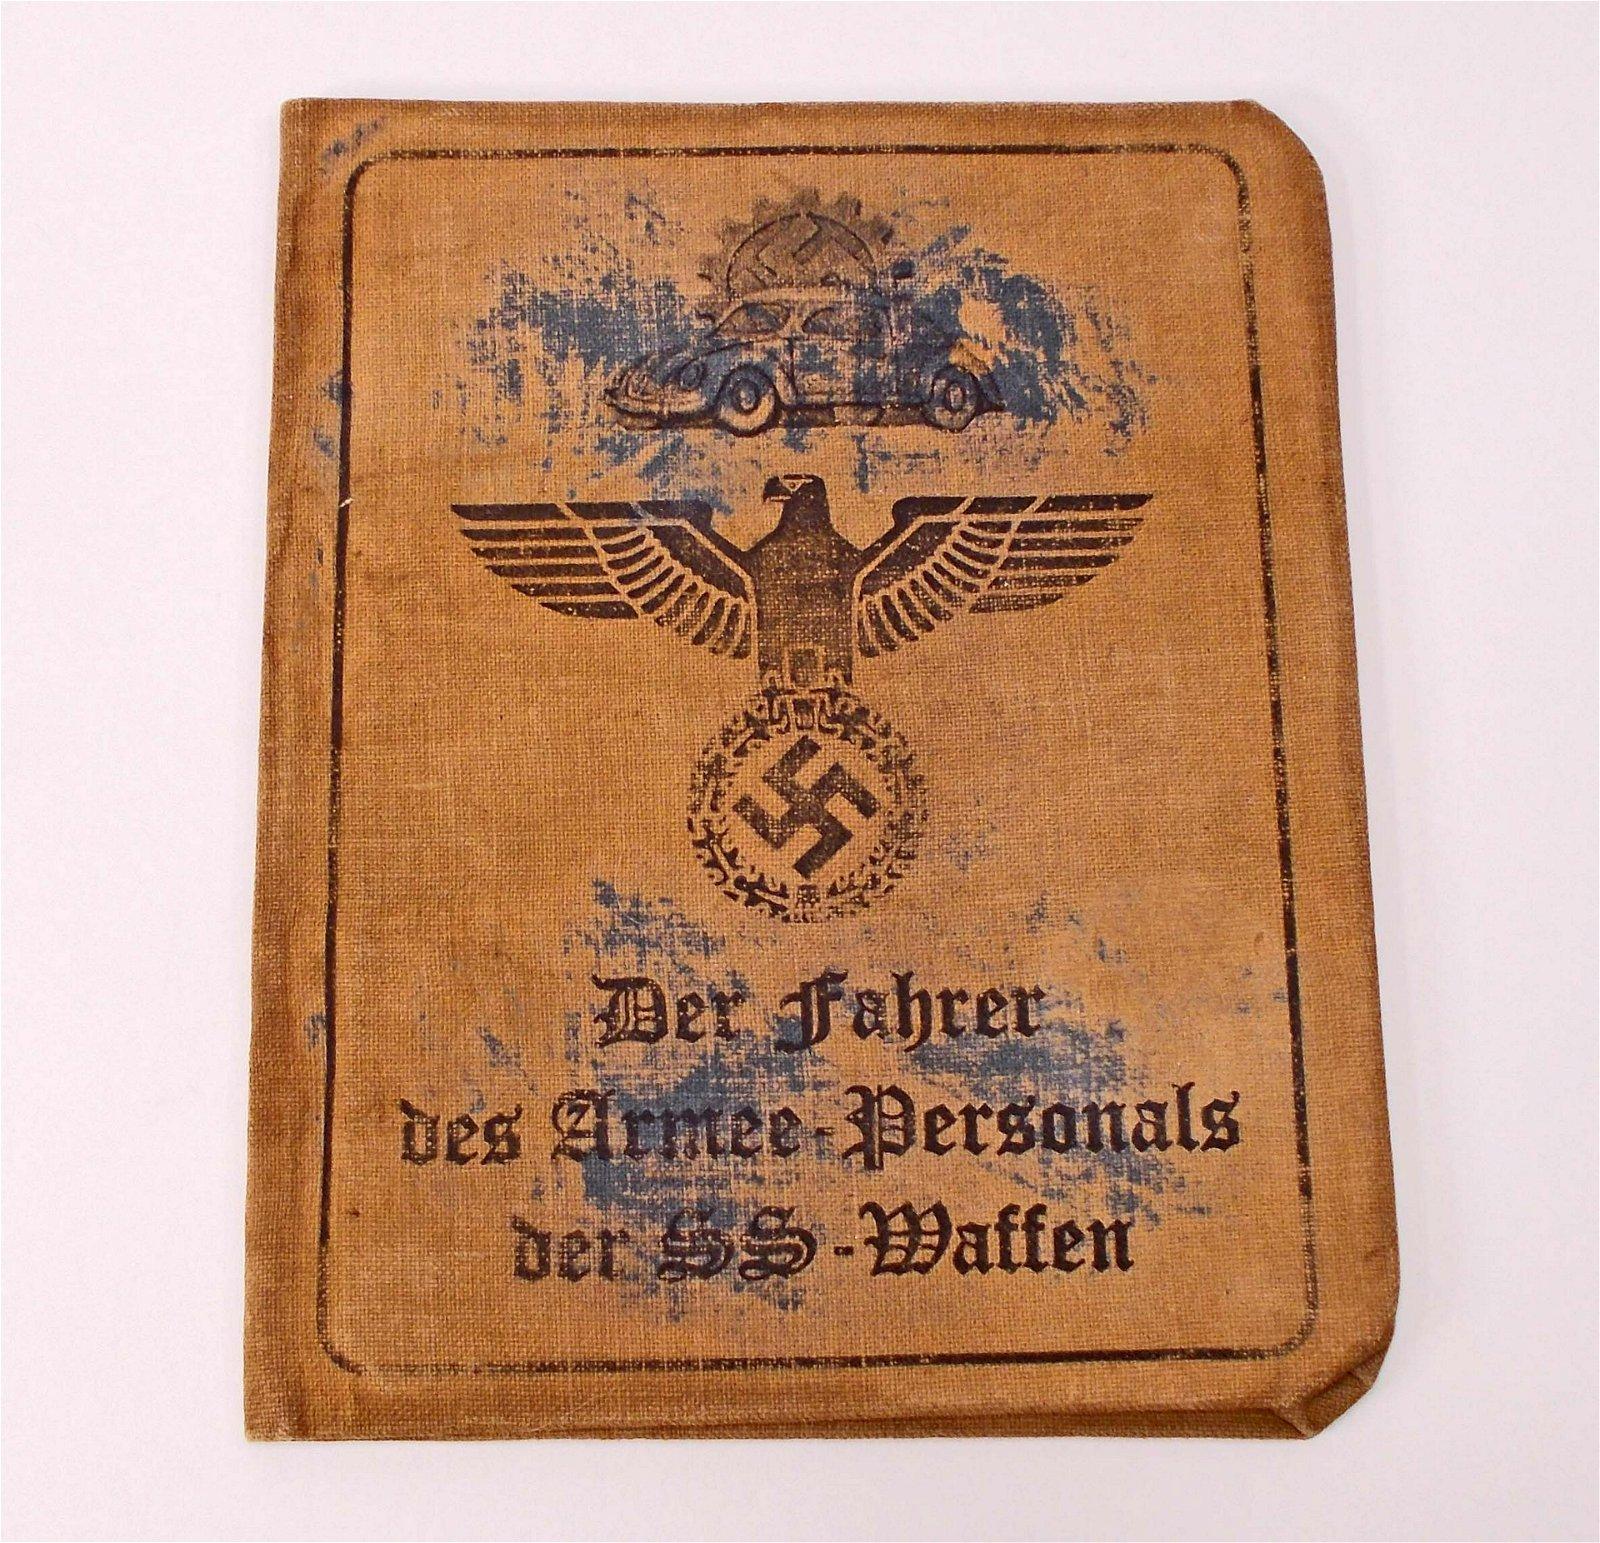 GERMAN NAZI SS DER FAHRER IDENTIFICATION BOOK